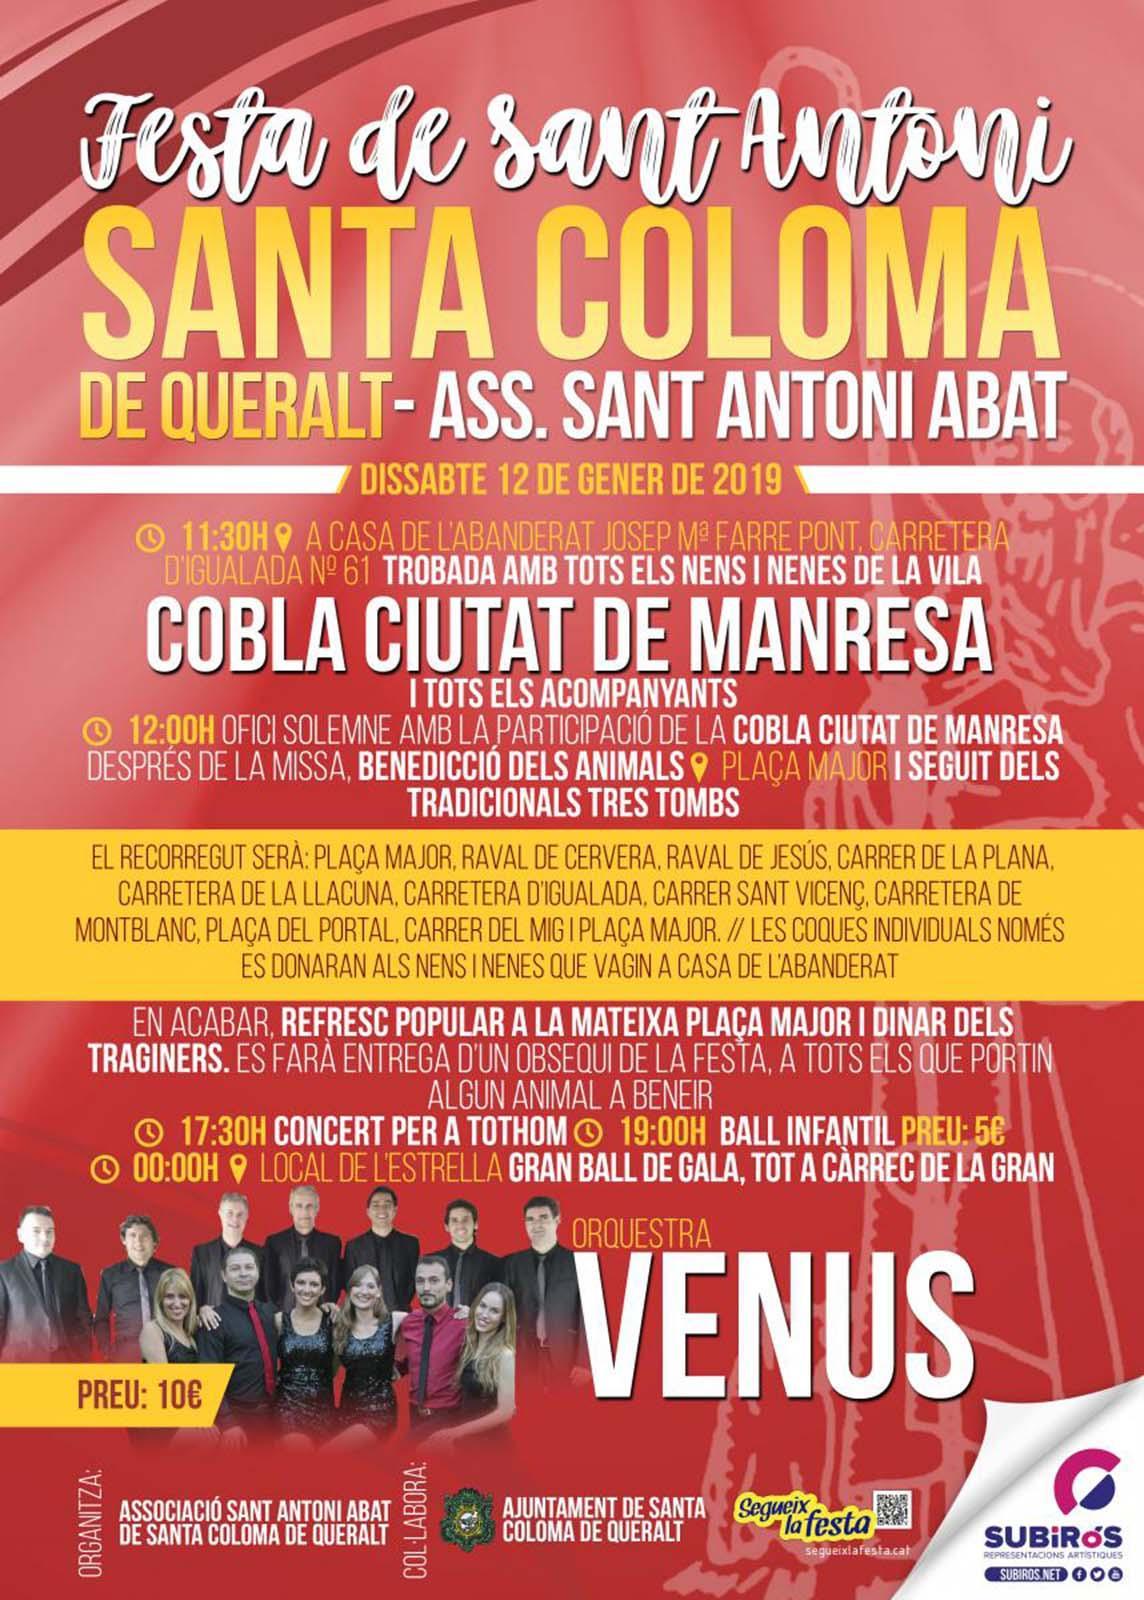 Festa de Sant Antoni 2019 Santa Coloma de Queralt